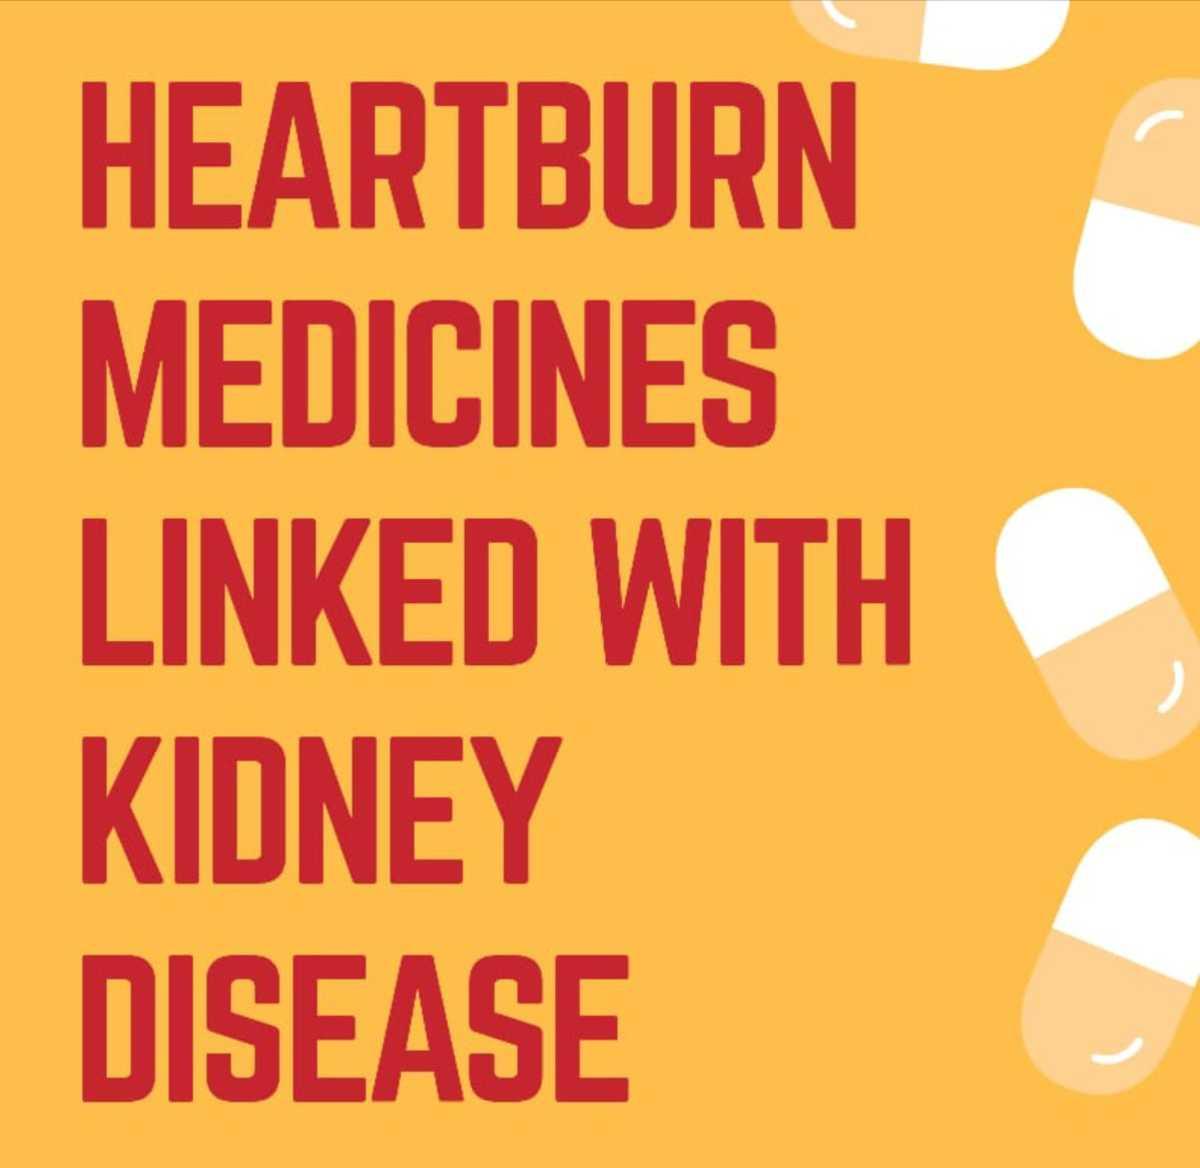 Proton pump inhibitors (Prevacid 24h. Prilosec, Nexium 24h) are yet again linked with risk of kidney disease.